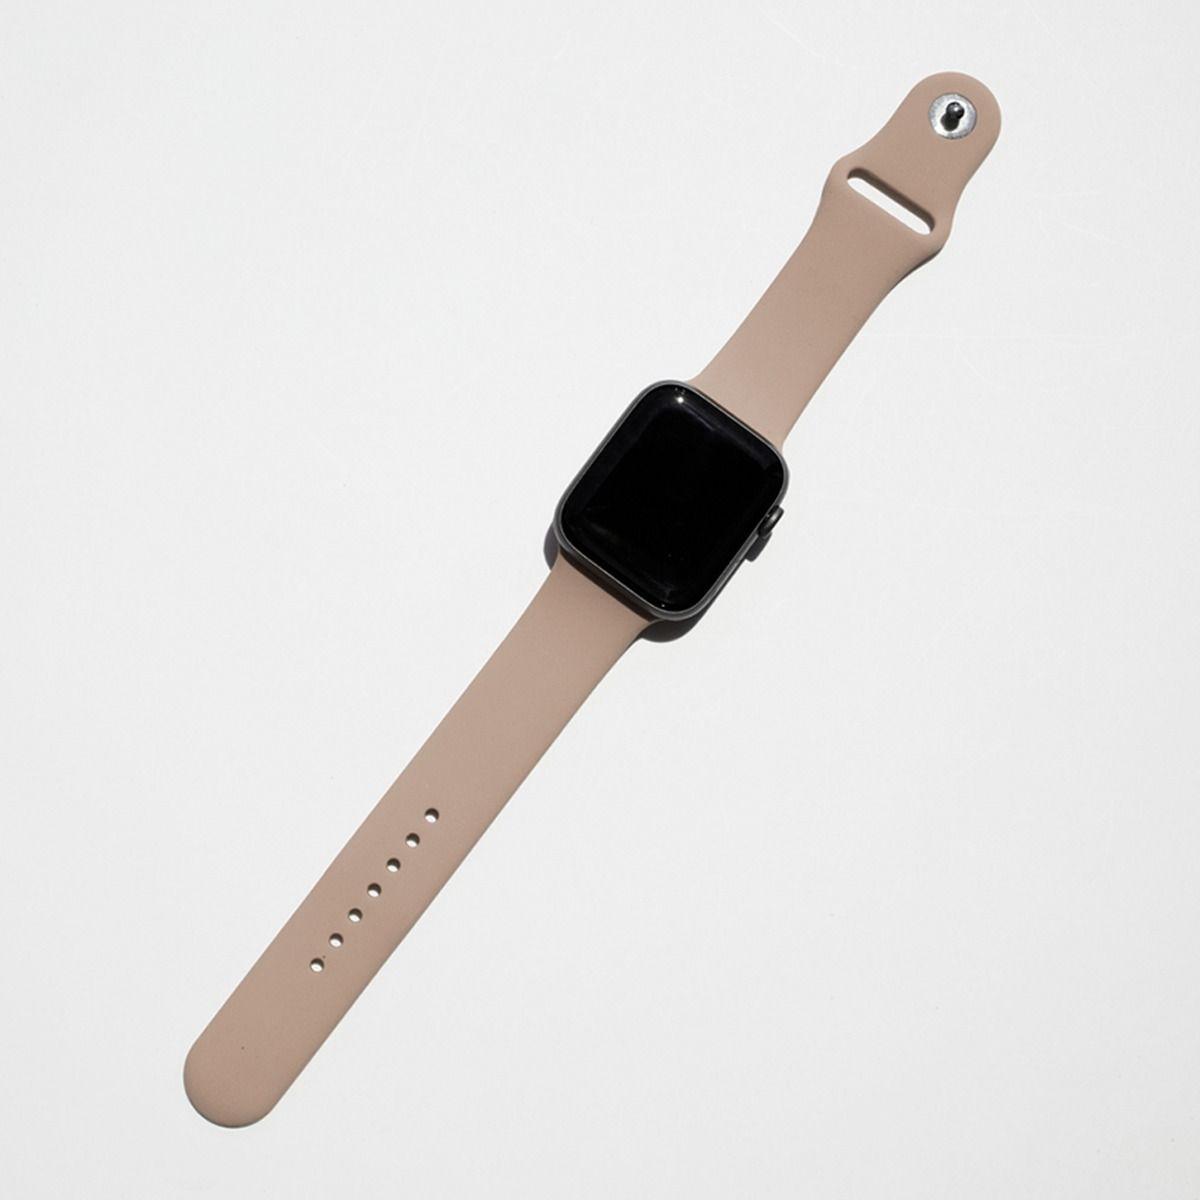 Silicone Apple Watch Band Walnut Apple Watch Silicone Band Watch Bands Cute Apple Watch Bands